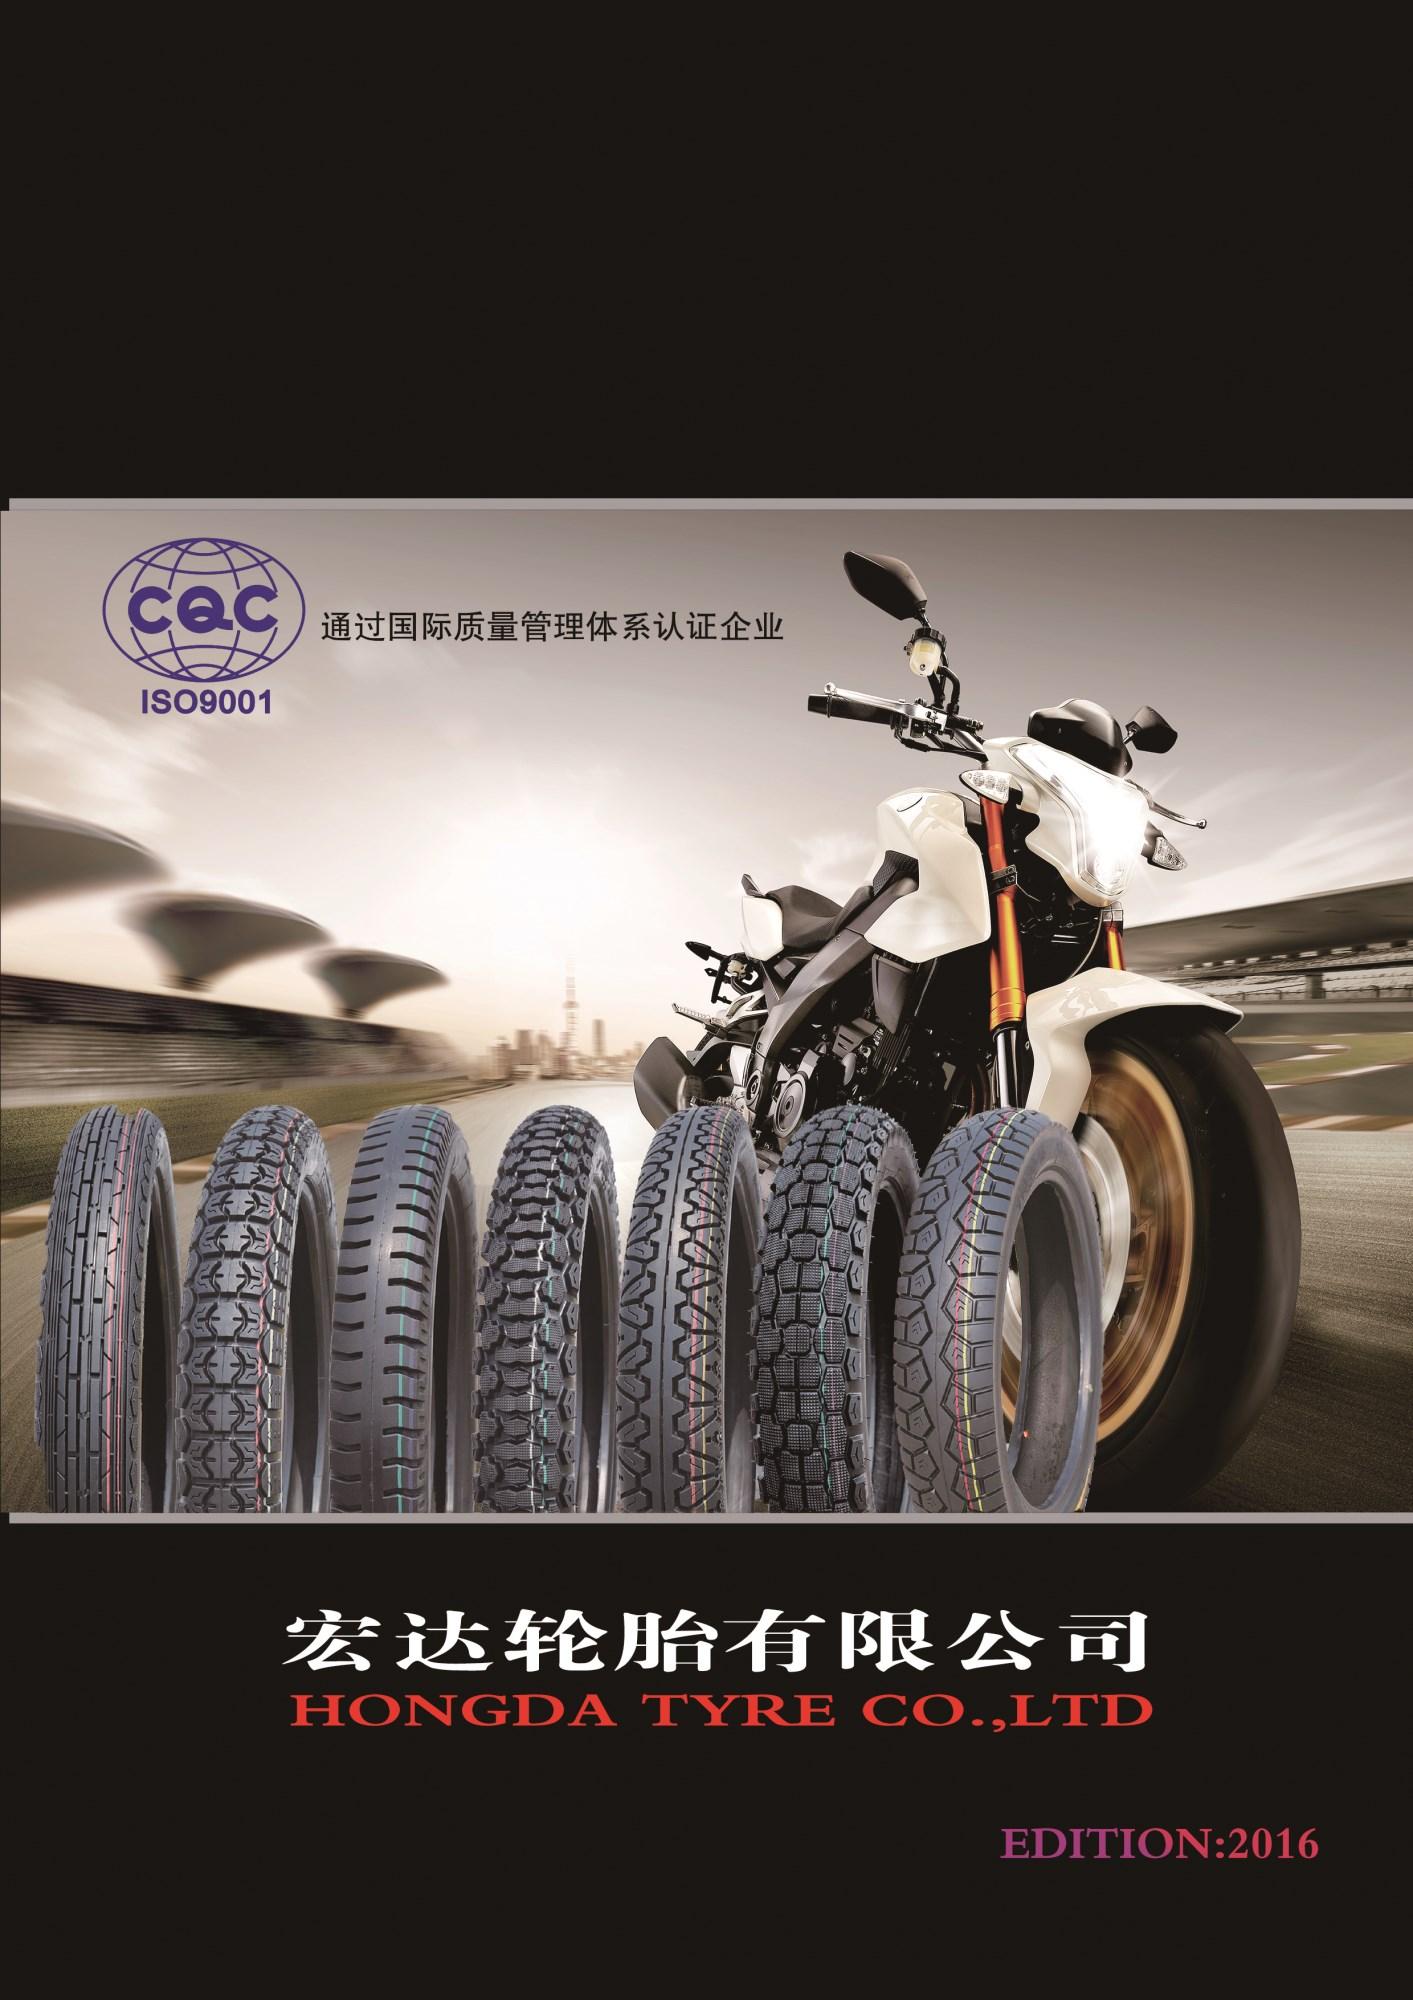 2017 HONGDA TYRE MOTORCYCLE TYRE CATALOGUE